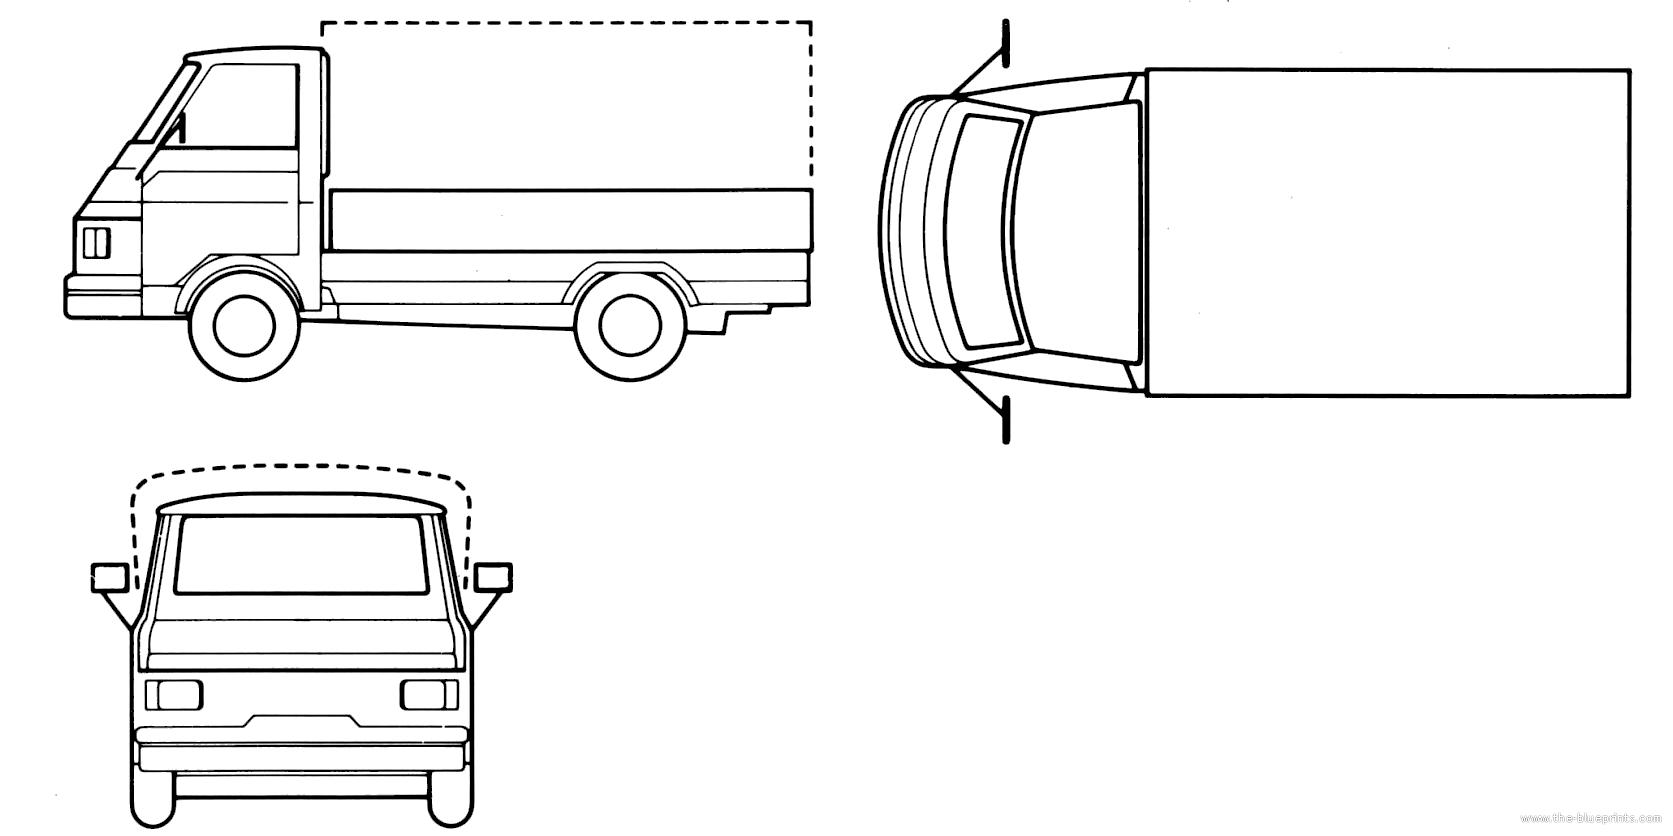 the-blueprints - blueprints > cars > various cars > piaggio